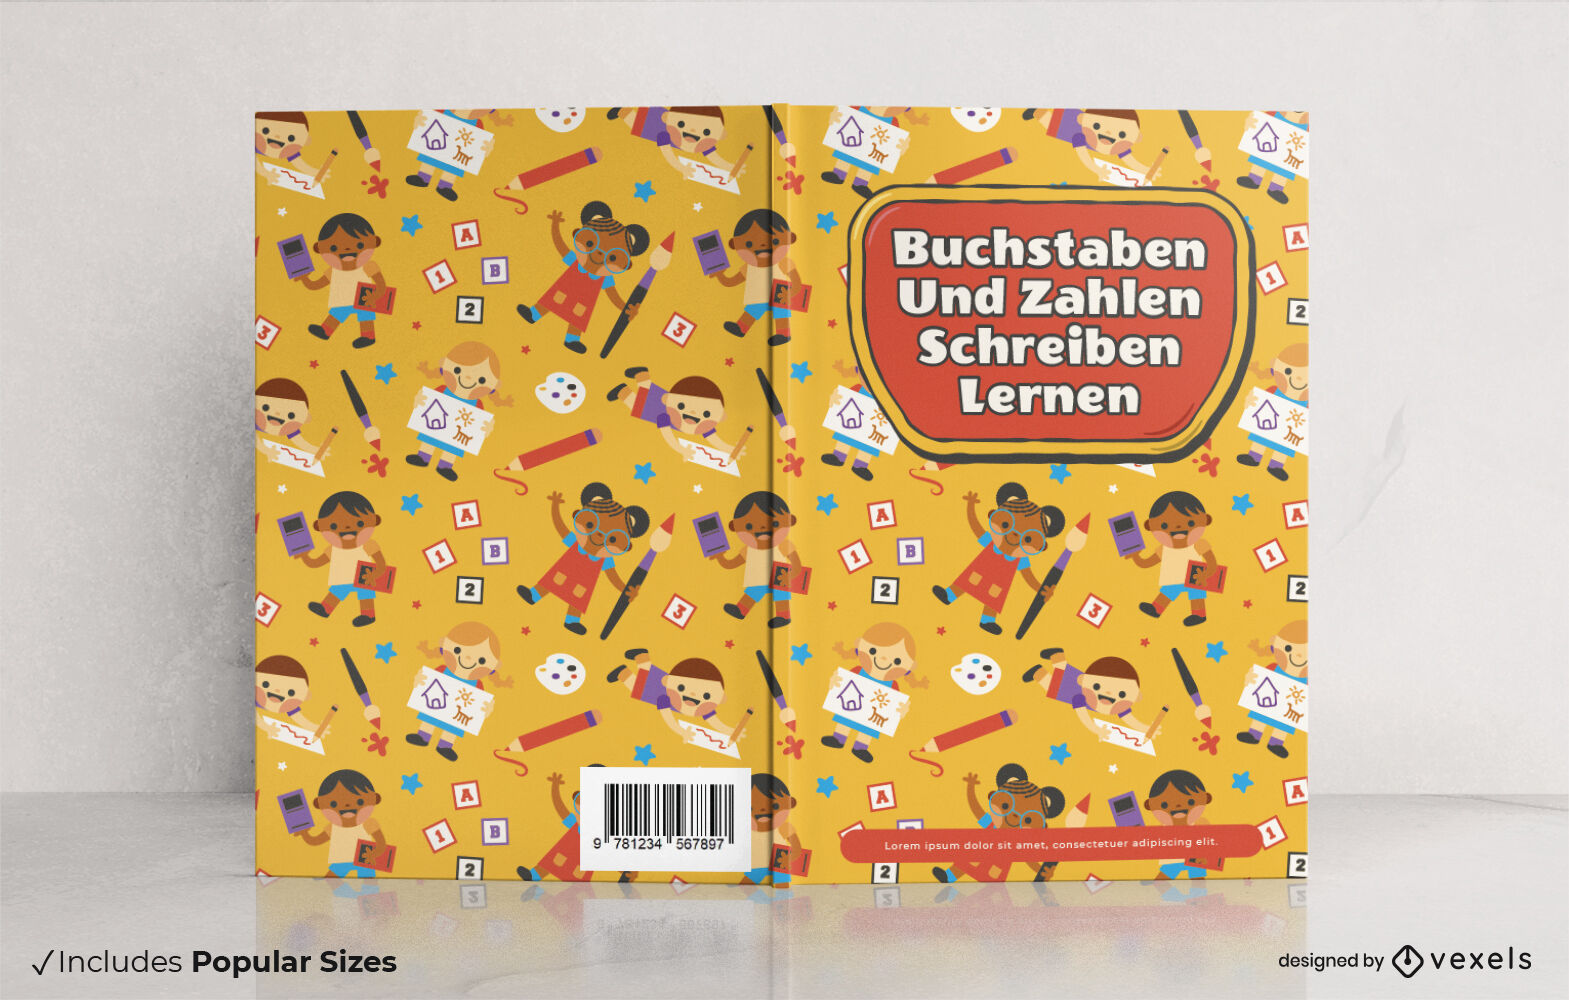 Gran aprendizaje de dise?o de portada de libros en alem?n